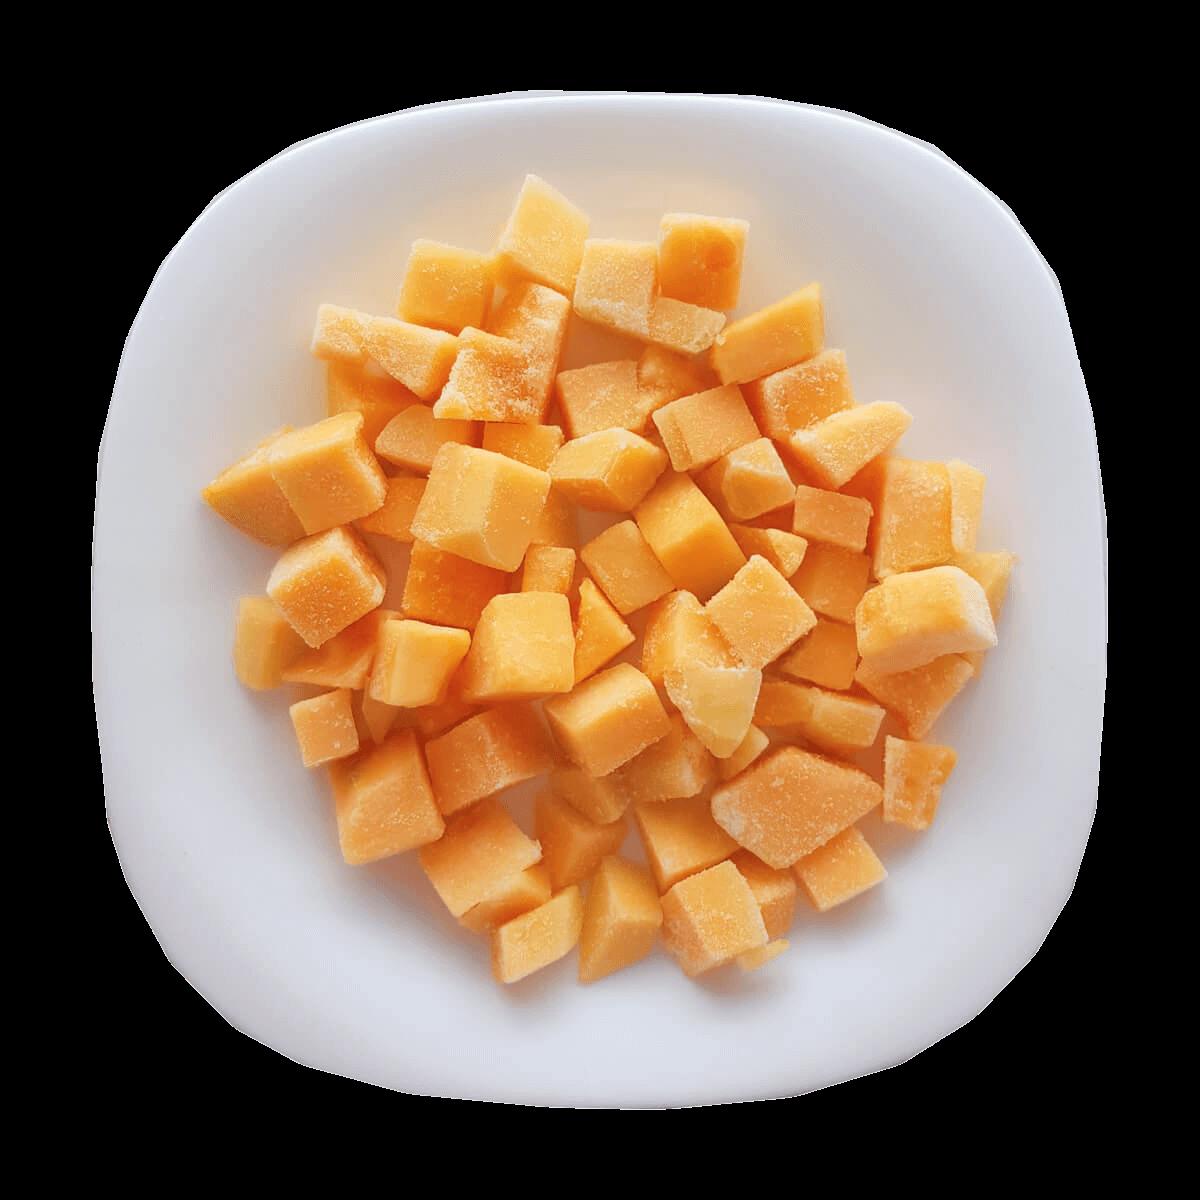 caribbean melon plate frozen costa rica